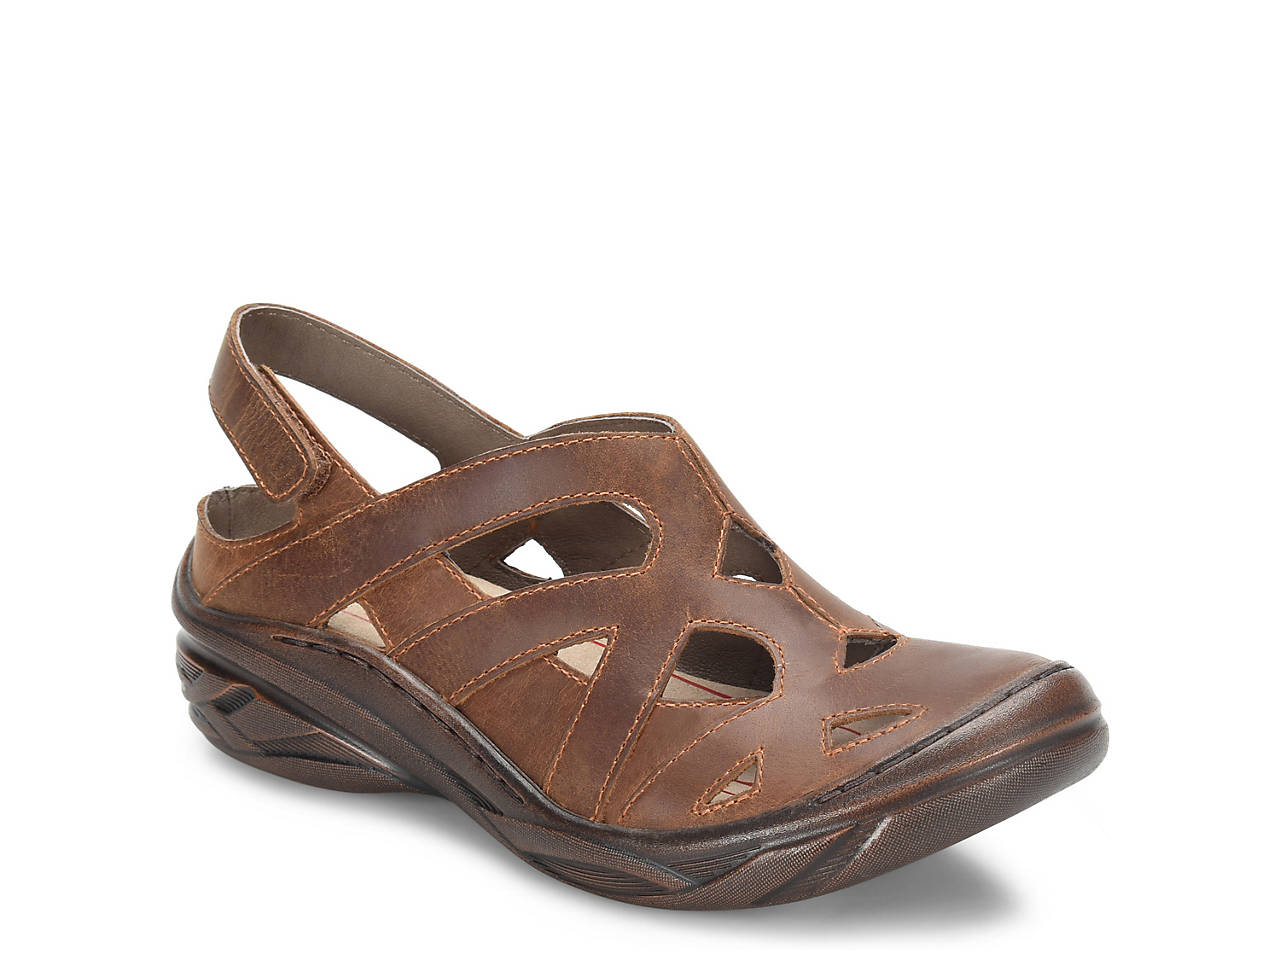 BIONICA Women's Maclean Sandal kQC68oL